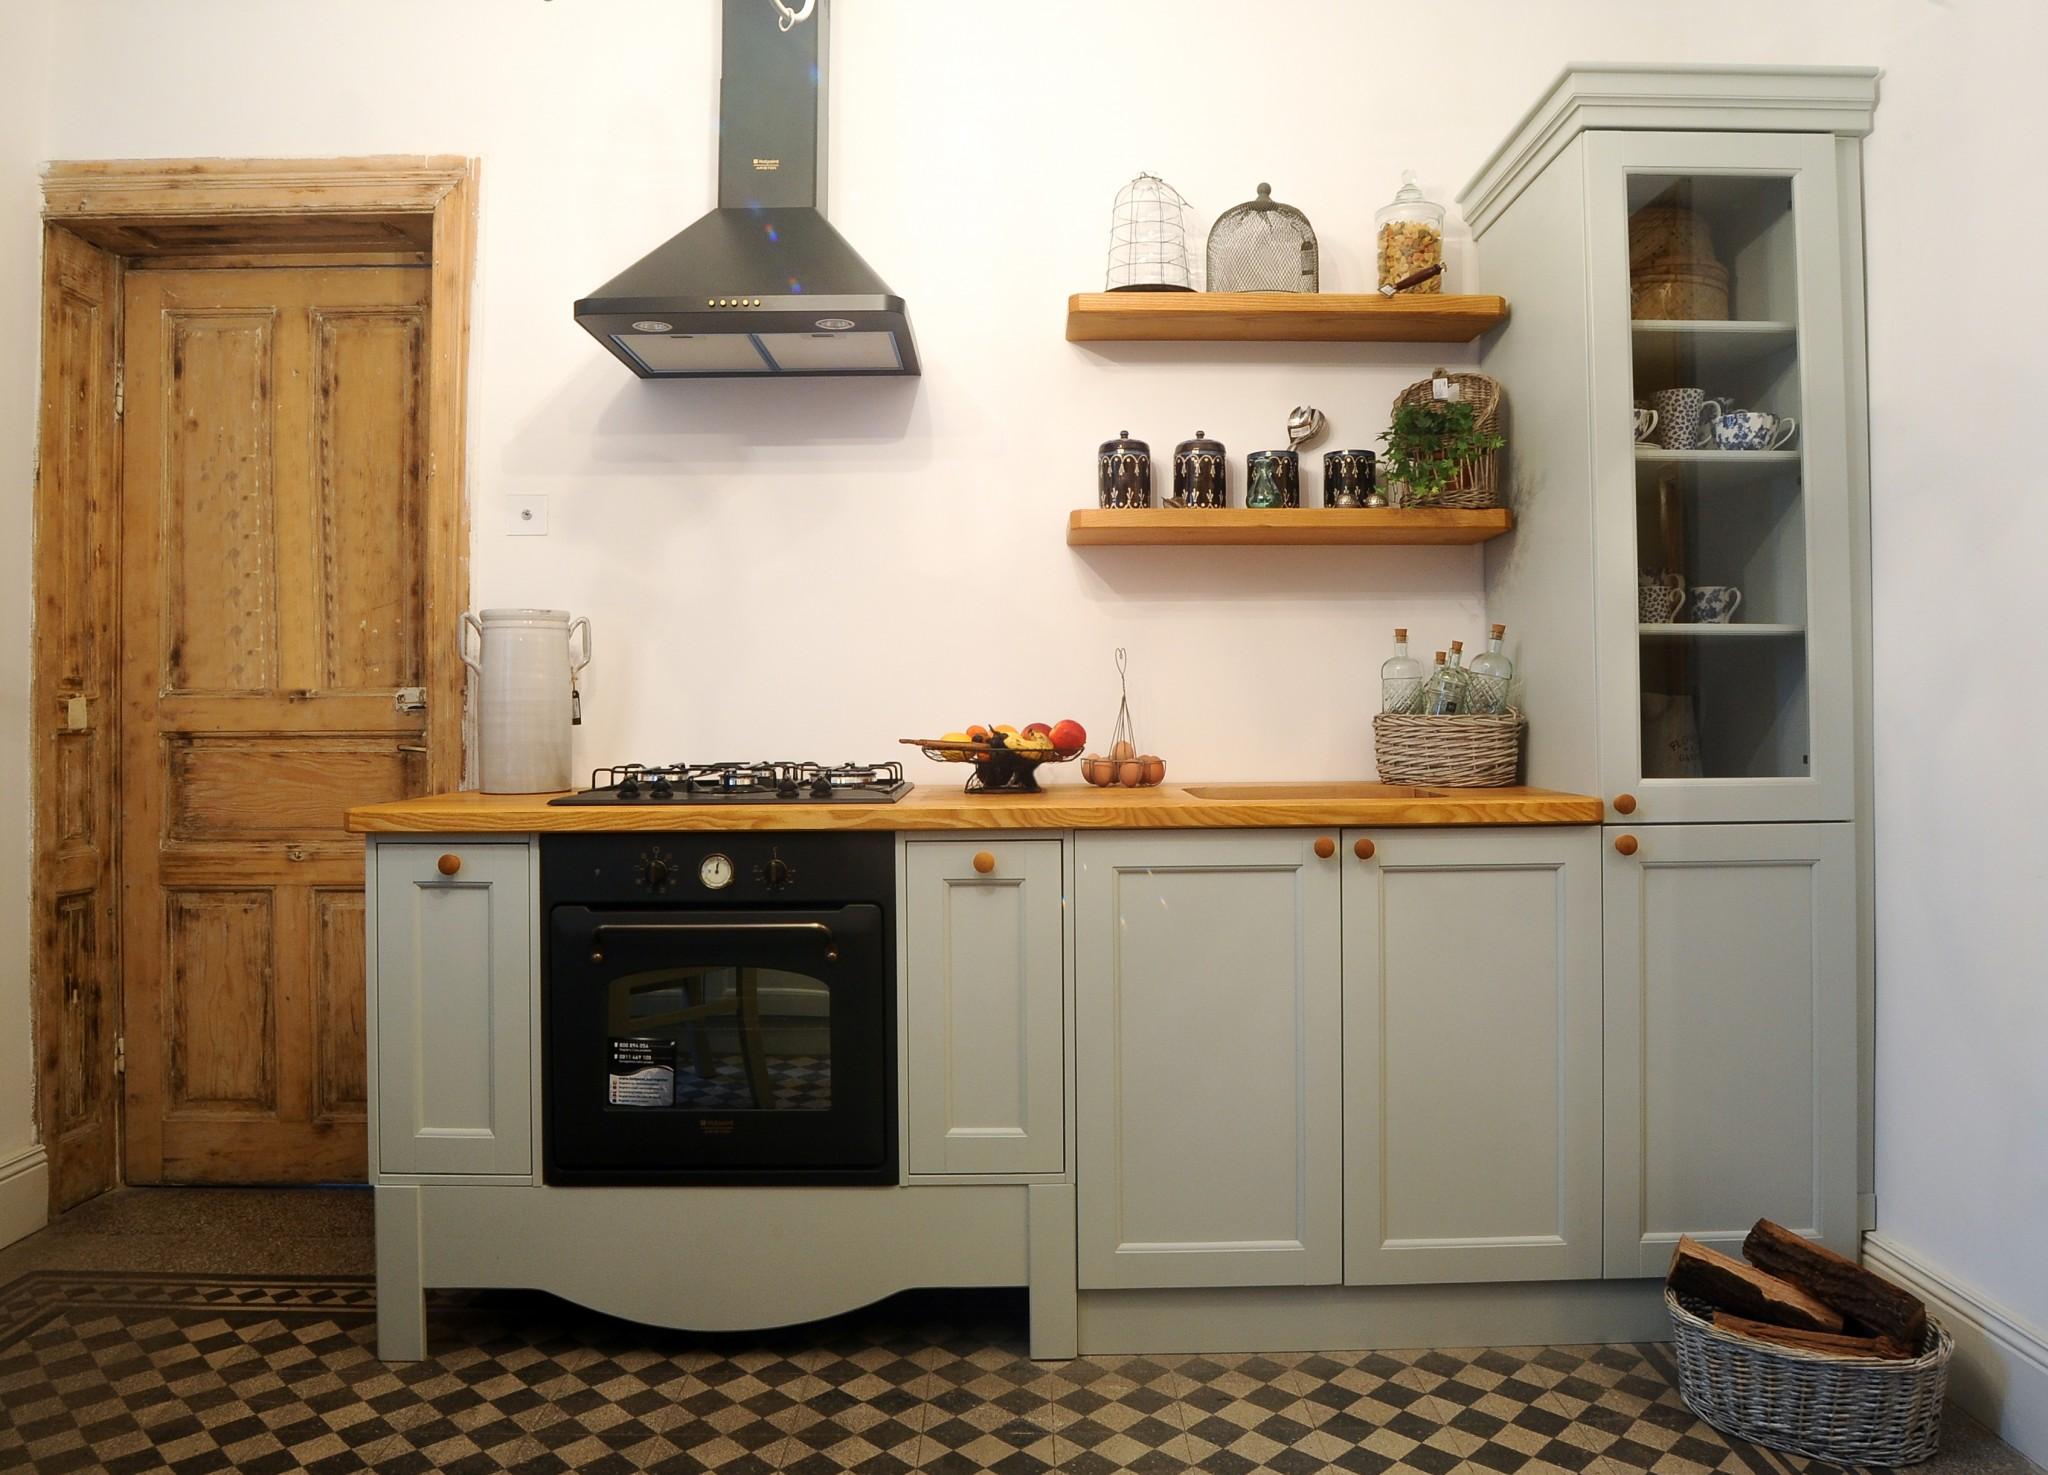 Mobilier de bucatarie din lemn masiv realizat la comanda – Definitia elegantei si a functionalitatii, in propriul tau camin!